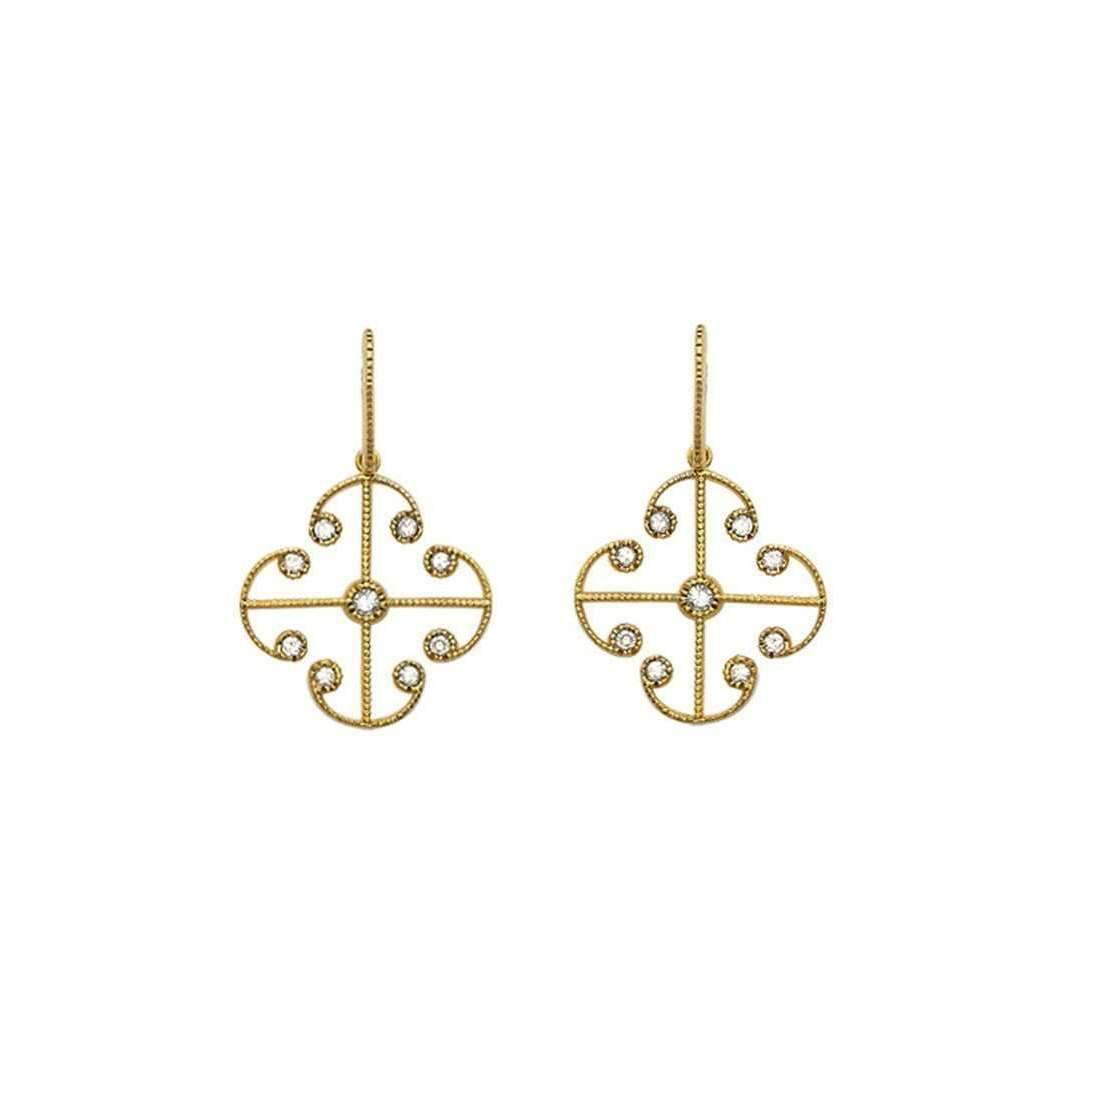 London Road Jewellery White Gold Brilliant Cut Diamond Lattice Earrings PZimy9Ln